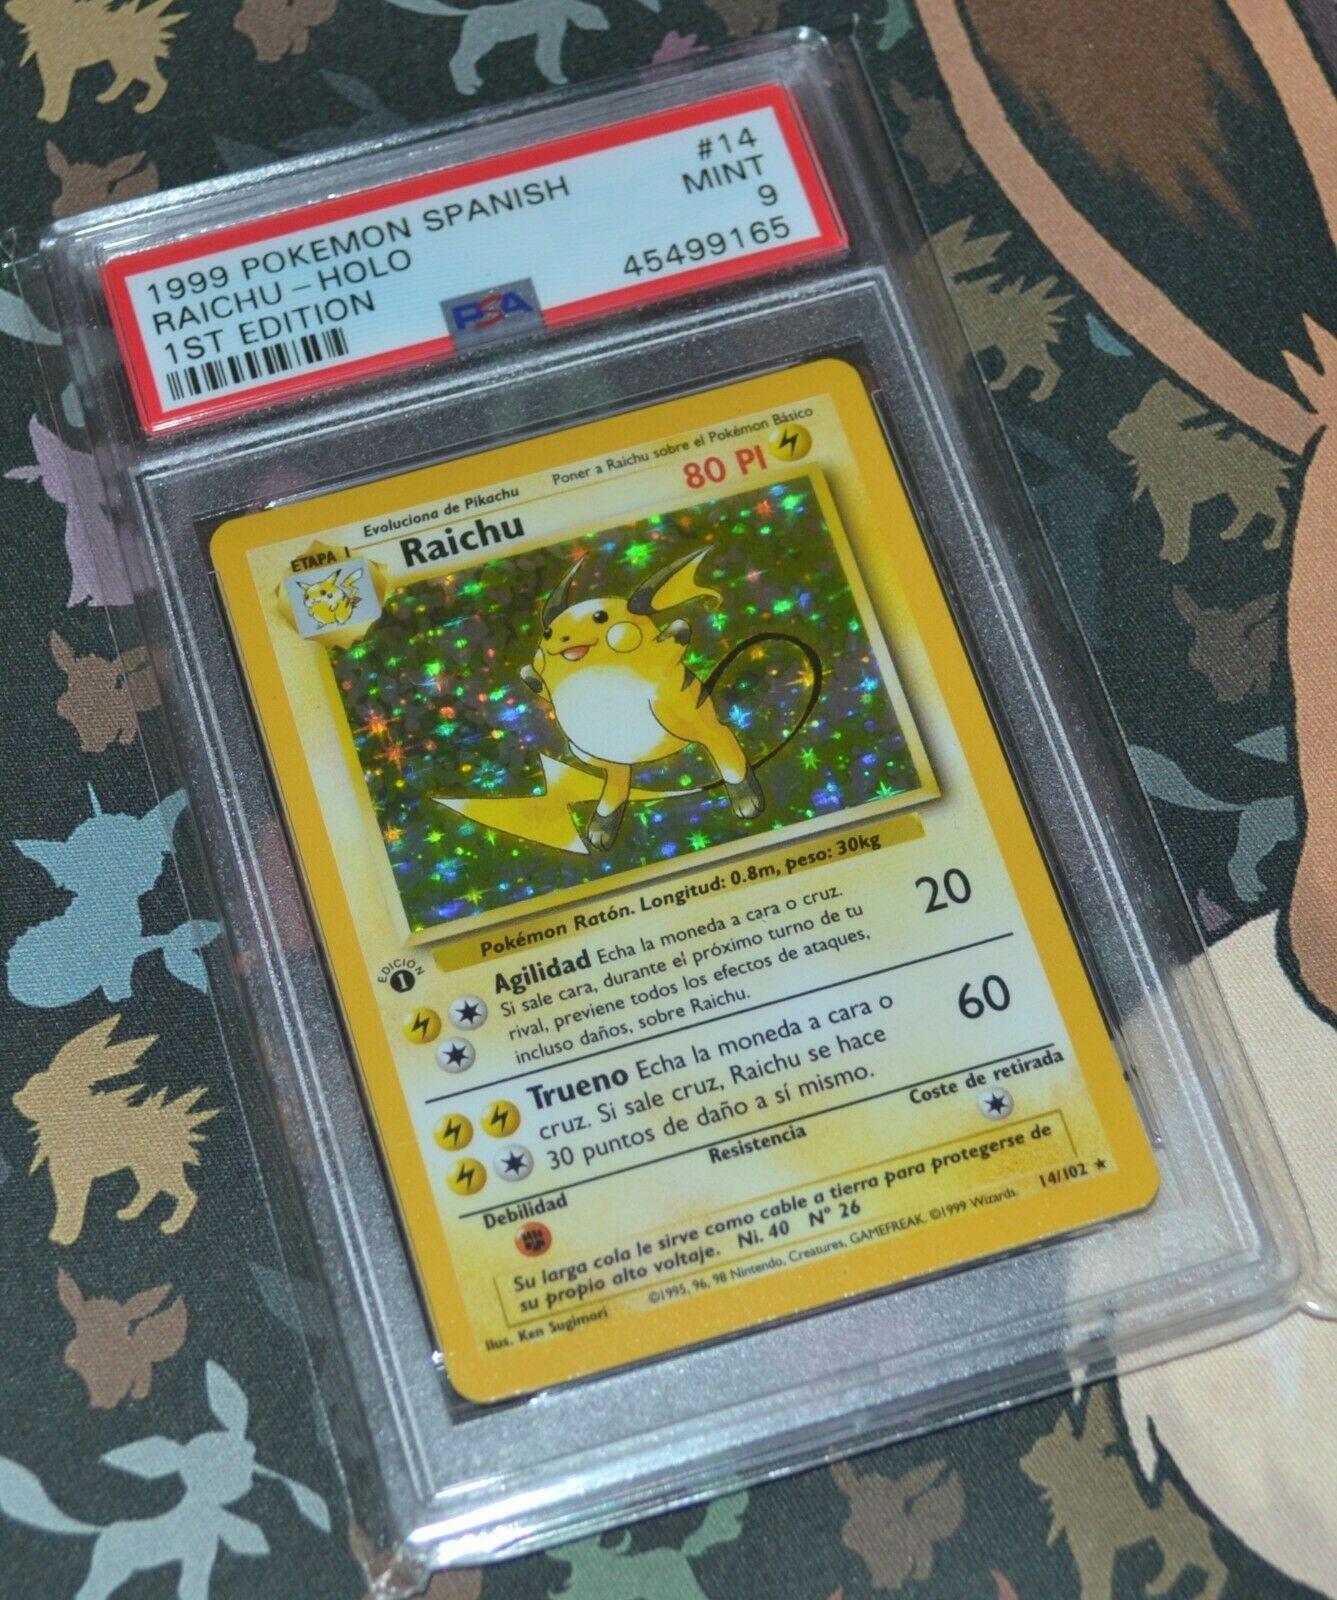 1999 Spanish Pokemon 1st Edition Base RAICHU Holo 14102   PSA 9